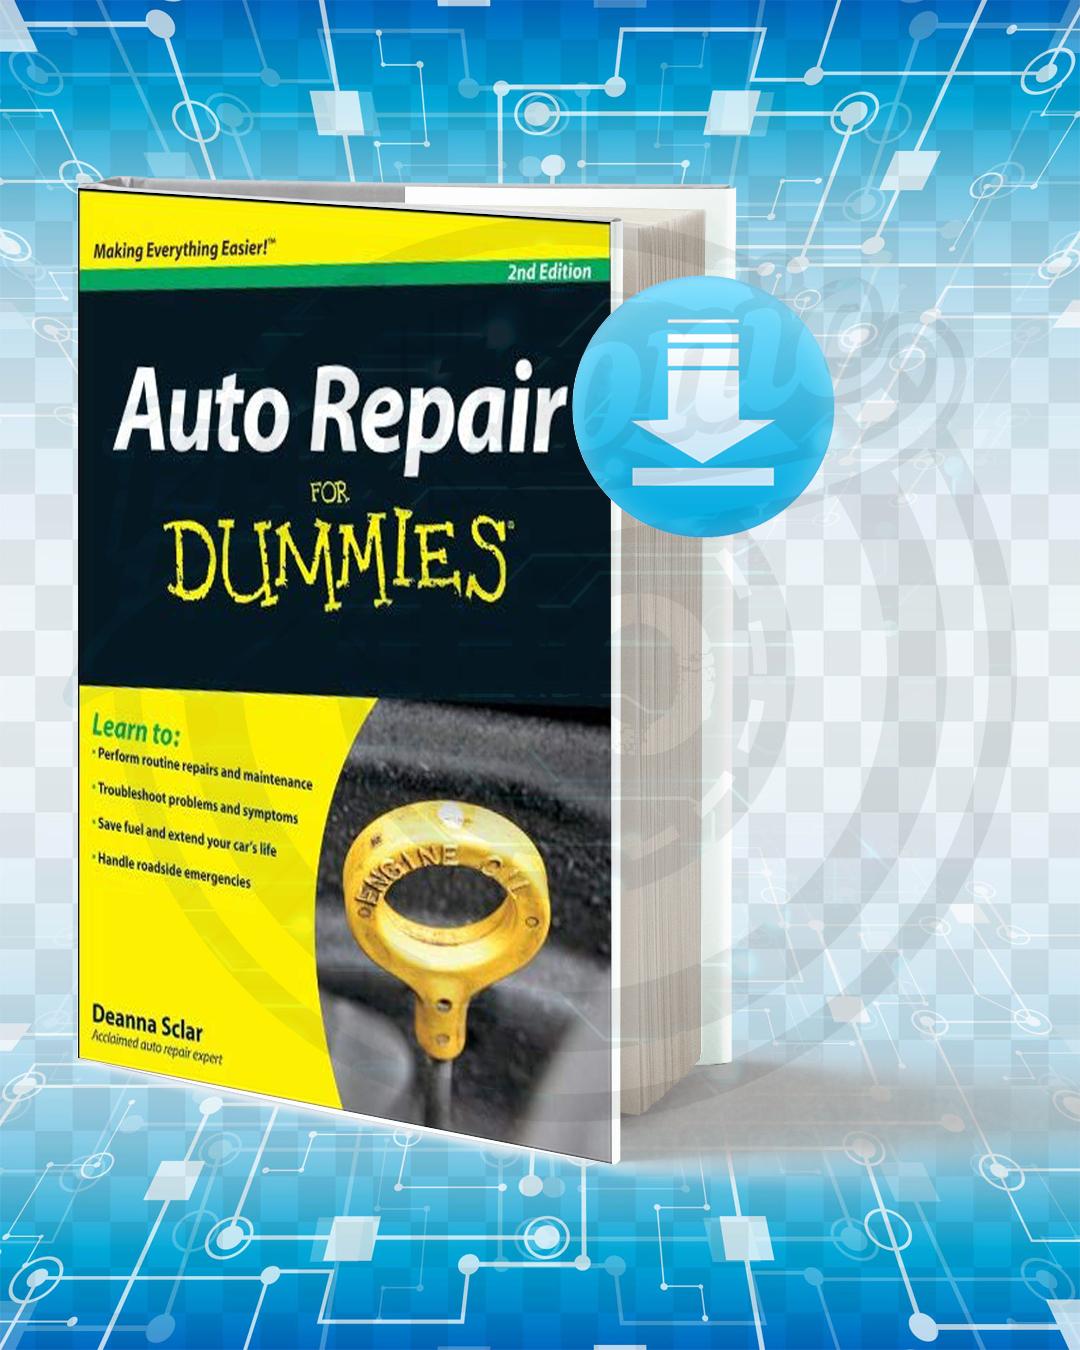 Free Book Auto Repair For Dummies pdf.